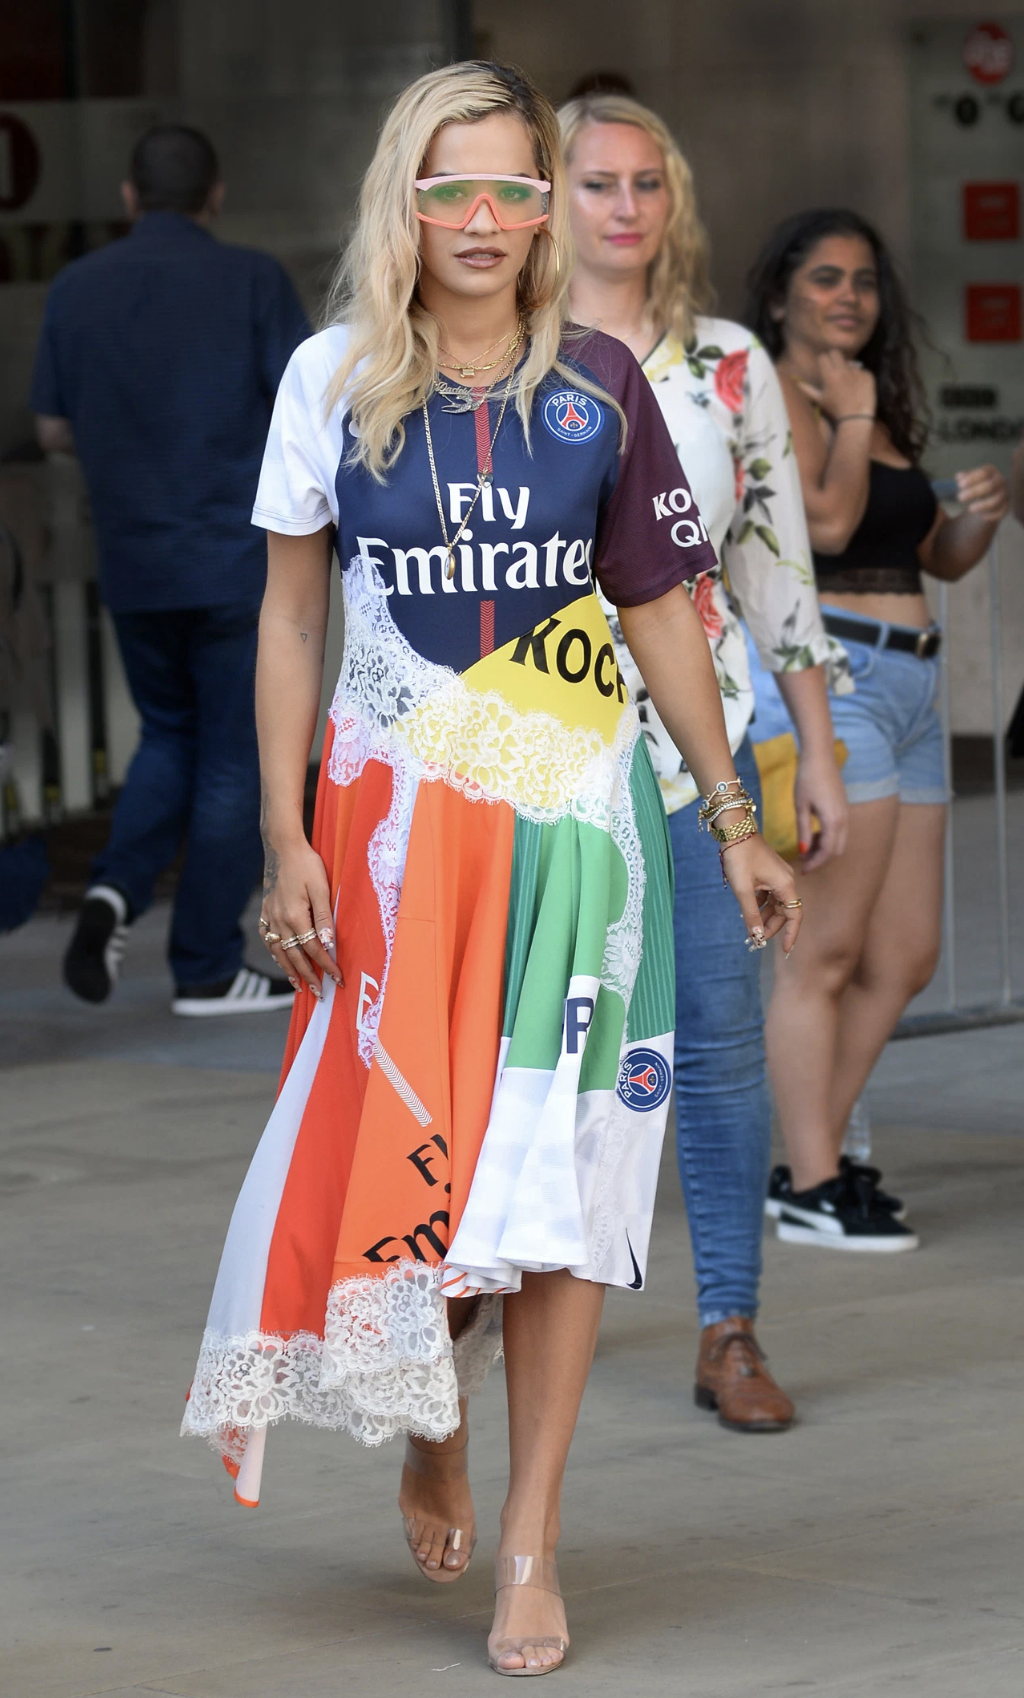 Koche X Paris Saint Germain Football Jersey Dress As Seen On Rita Ora Football Jersey Dress Rita Ora Rita Ora Style